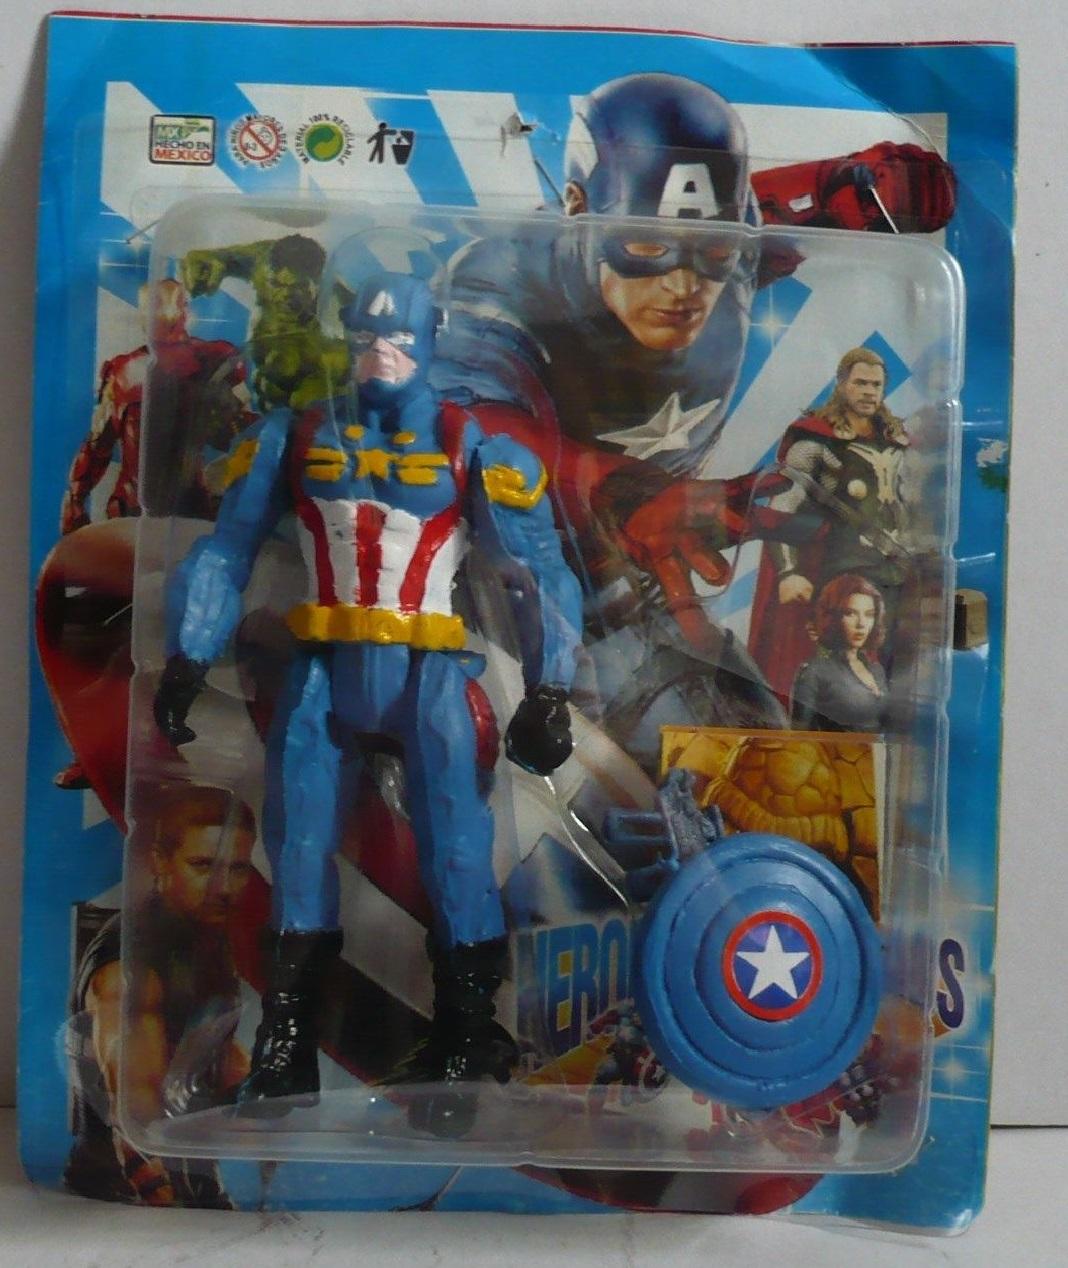 Captain America (Legendary Heroes figure)